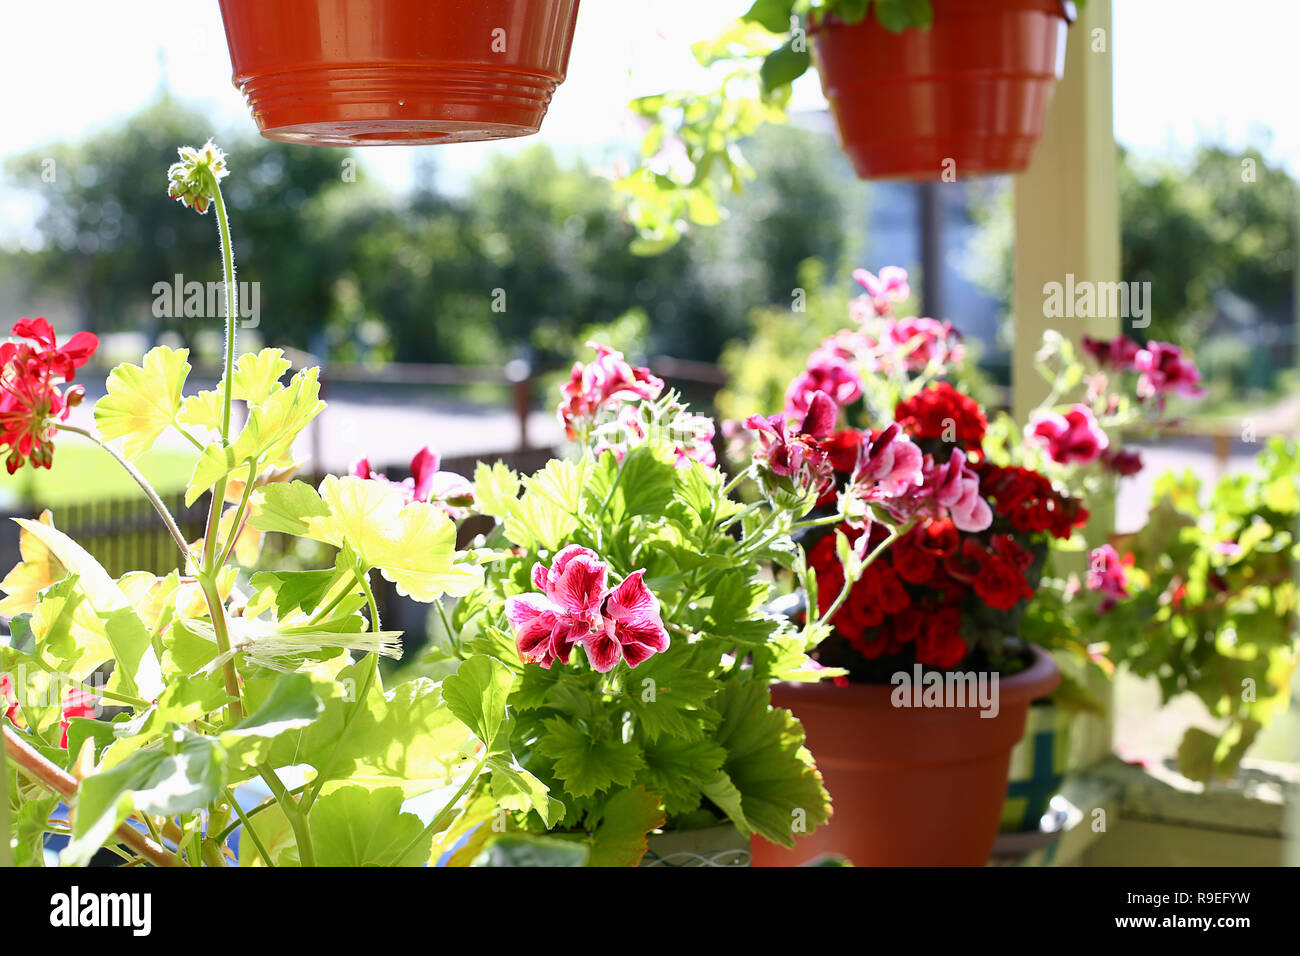 Blumen In Topfe Auf Dem Balkon Fensterbank Fenster Fruhling